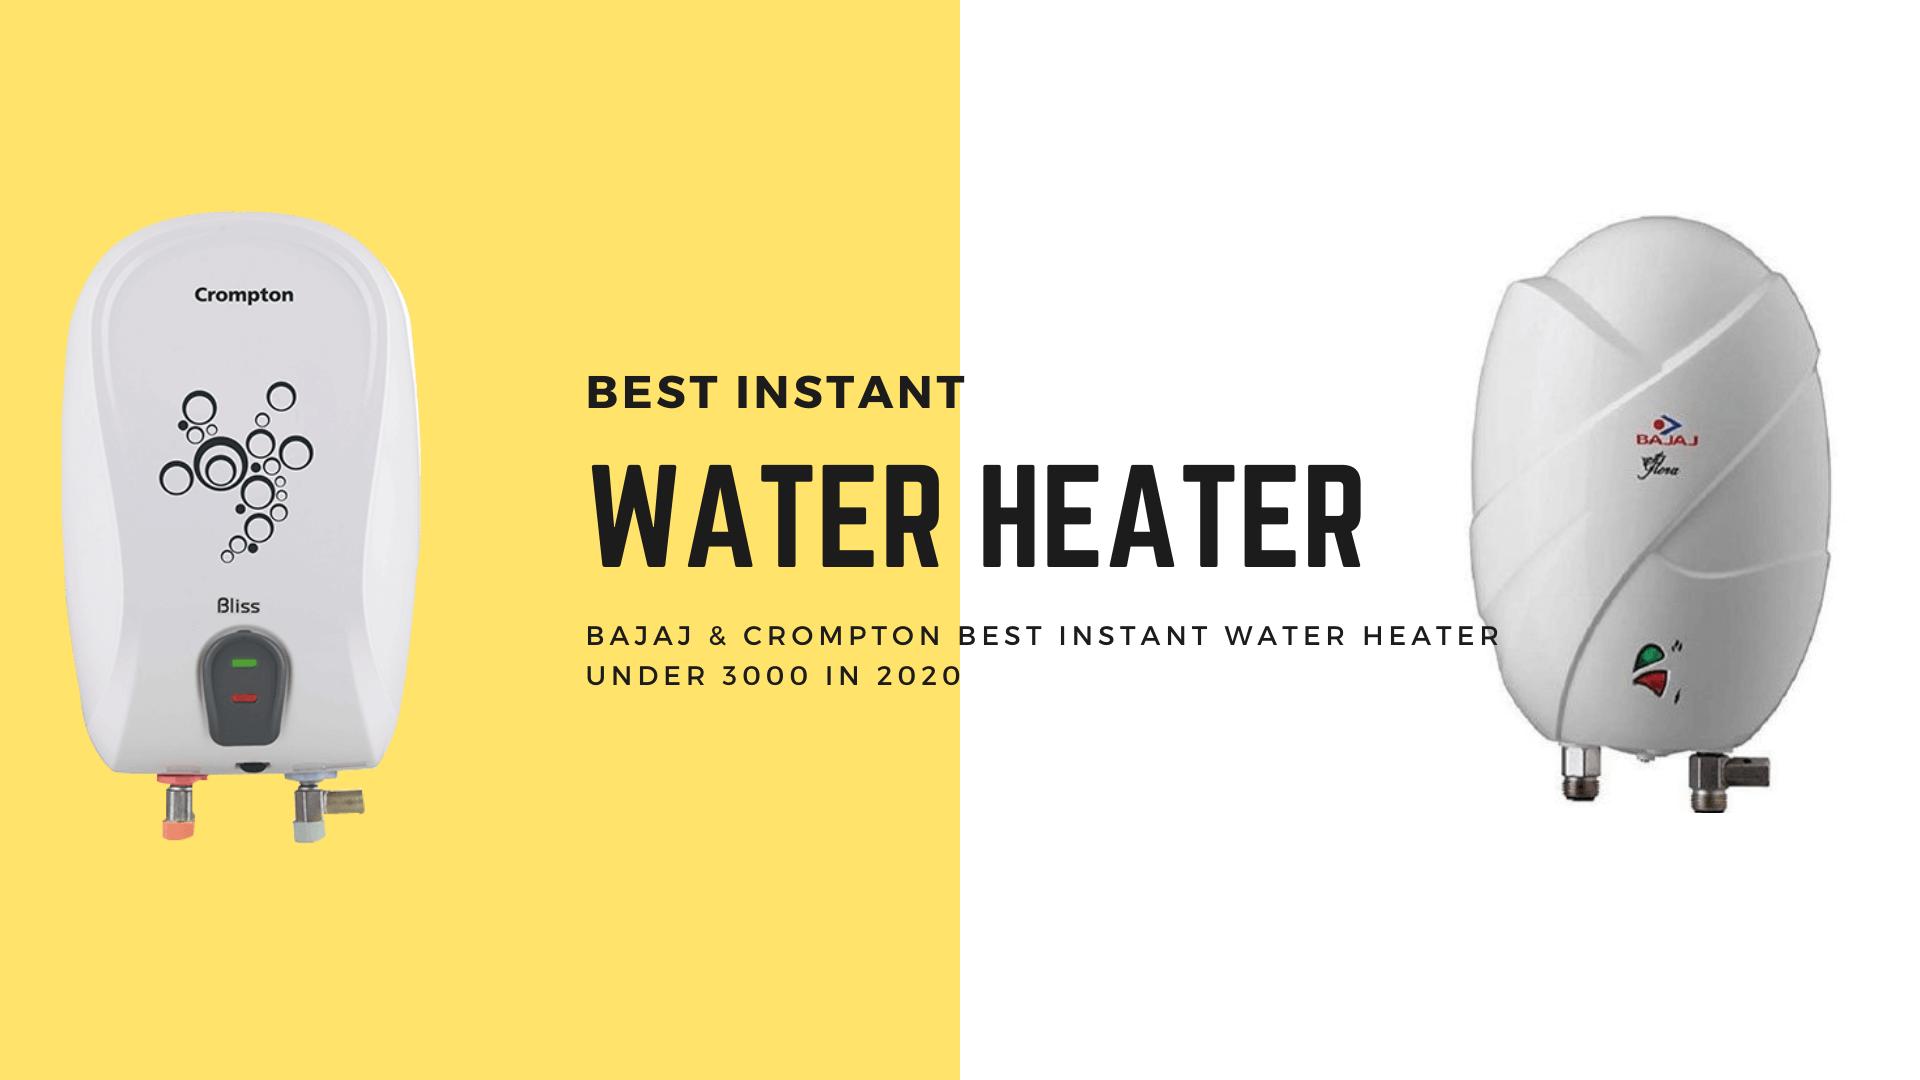 Bajaj & Crompton Best Instant Water Heater Under 3000 in 2020